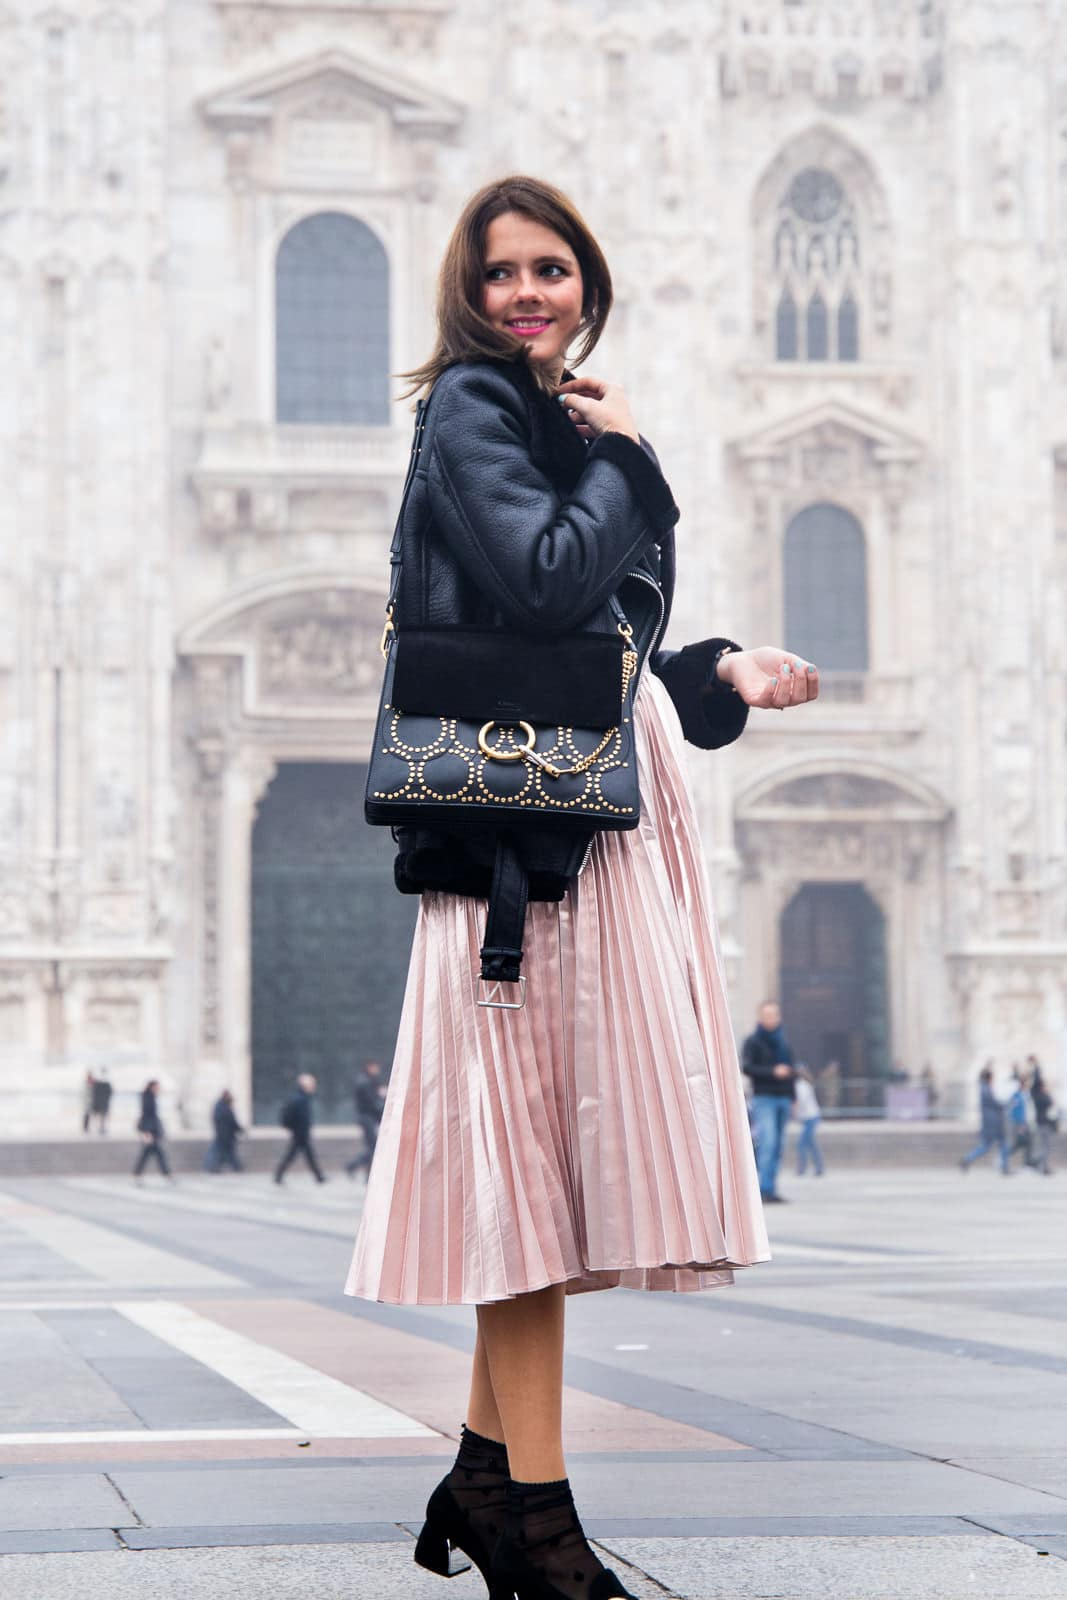 Streetstyle Duomo Milano: Metallic Midiskirt, Biker Jacke & Granny Shoes